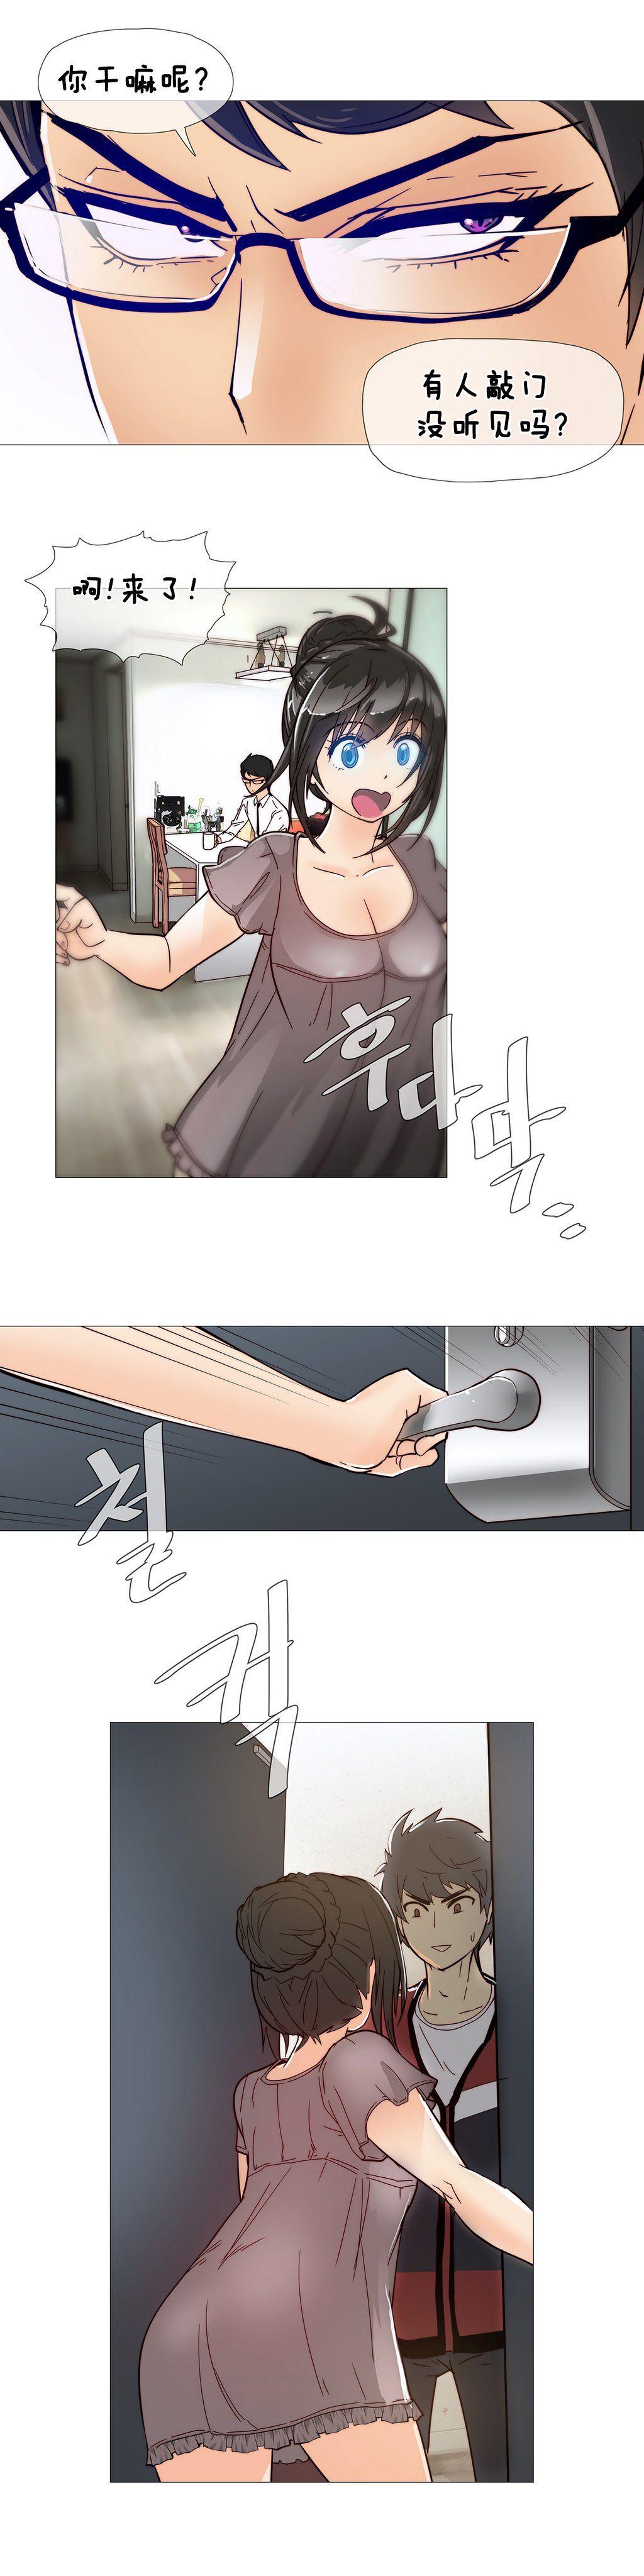 HouseHold Affairs 【卞赤鲤个人汉化】1~33话(持续更新中) 156